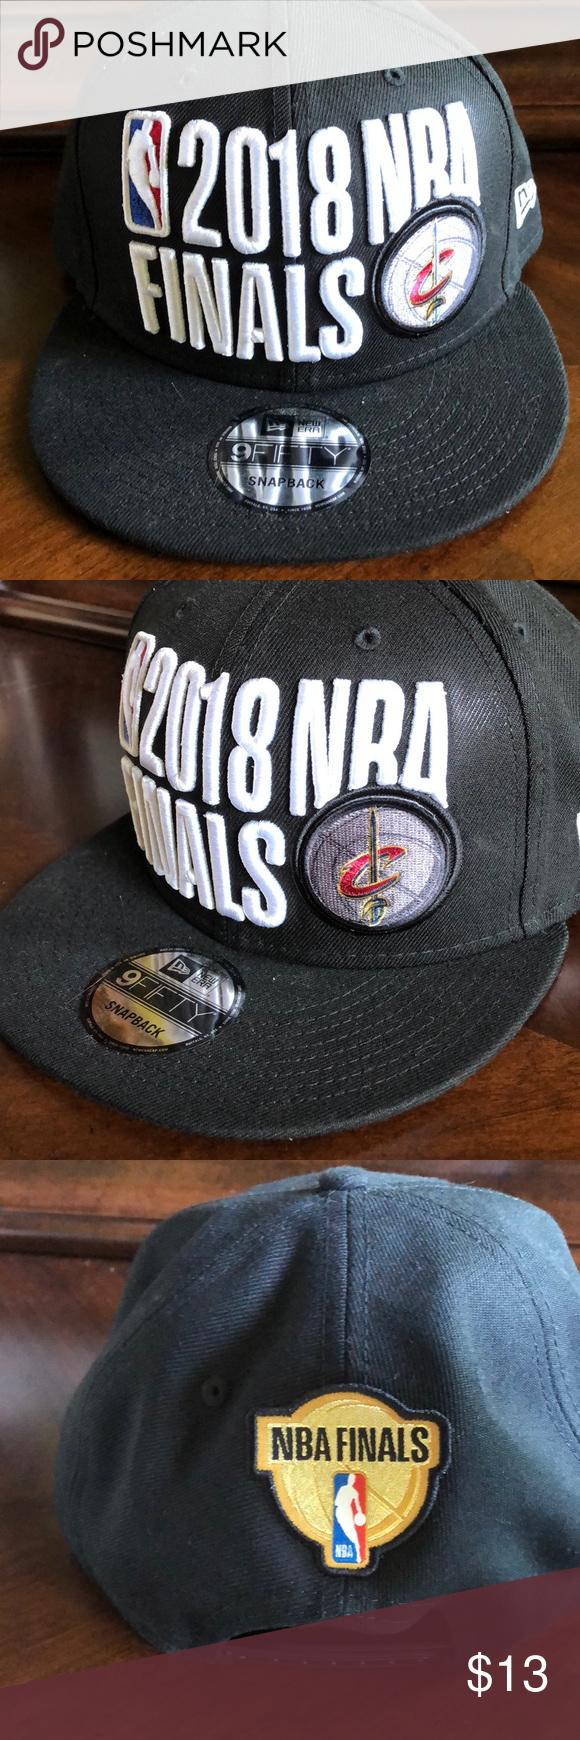 657a6ddcfd316e NBA Finals Hat Cleveland Cavaliers NBA finals hat. Never worn New Era  Accessories Hats